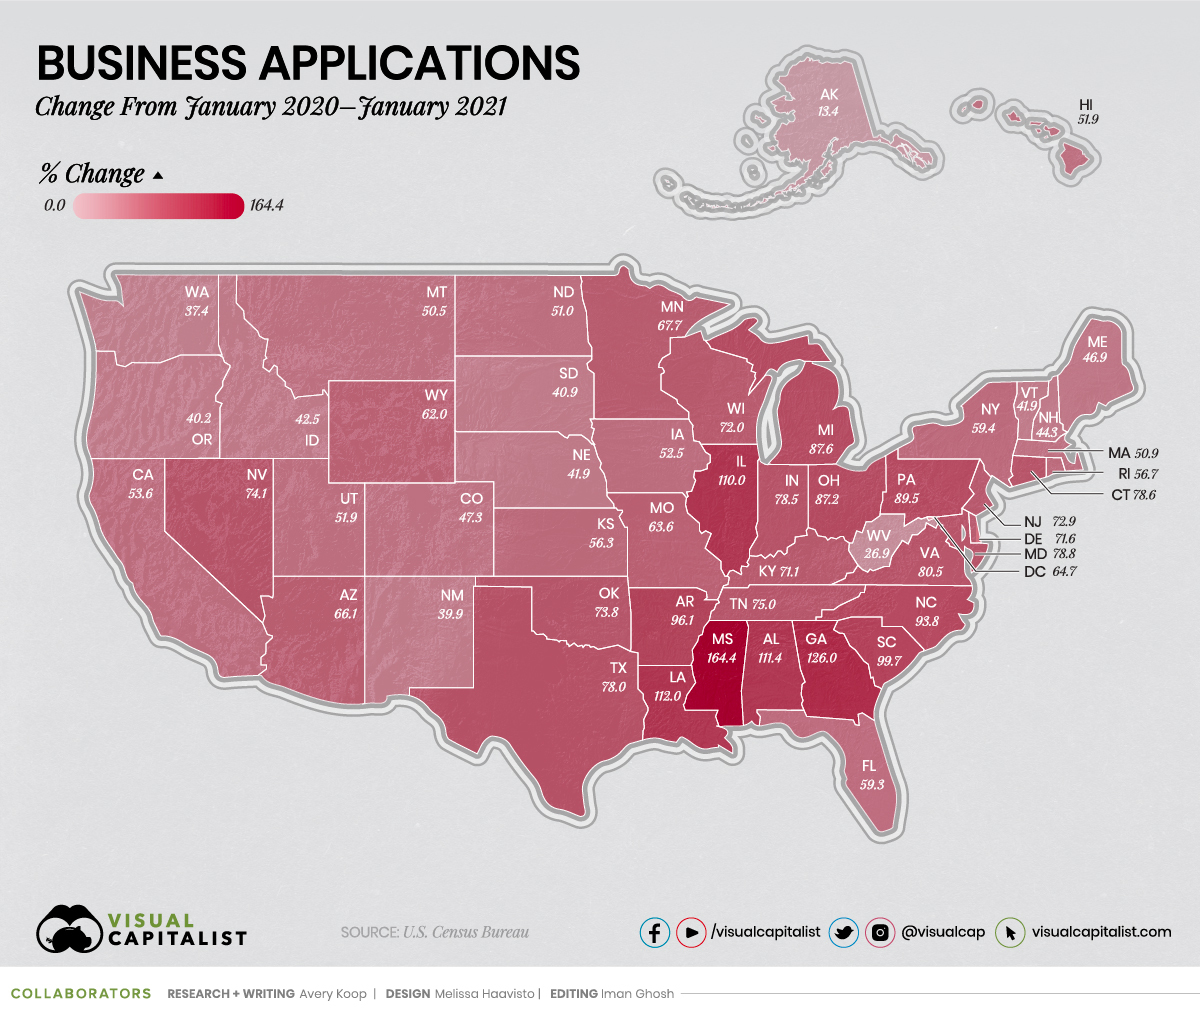 entrepreneurial spirit in America